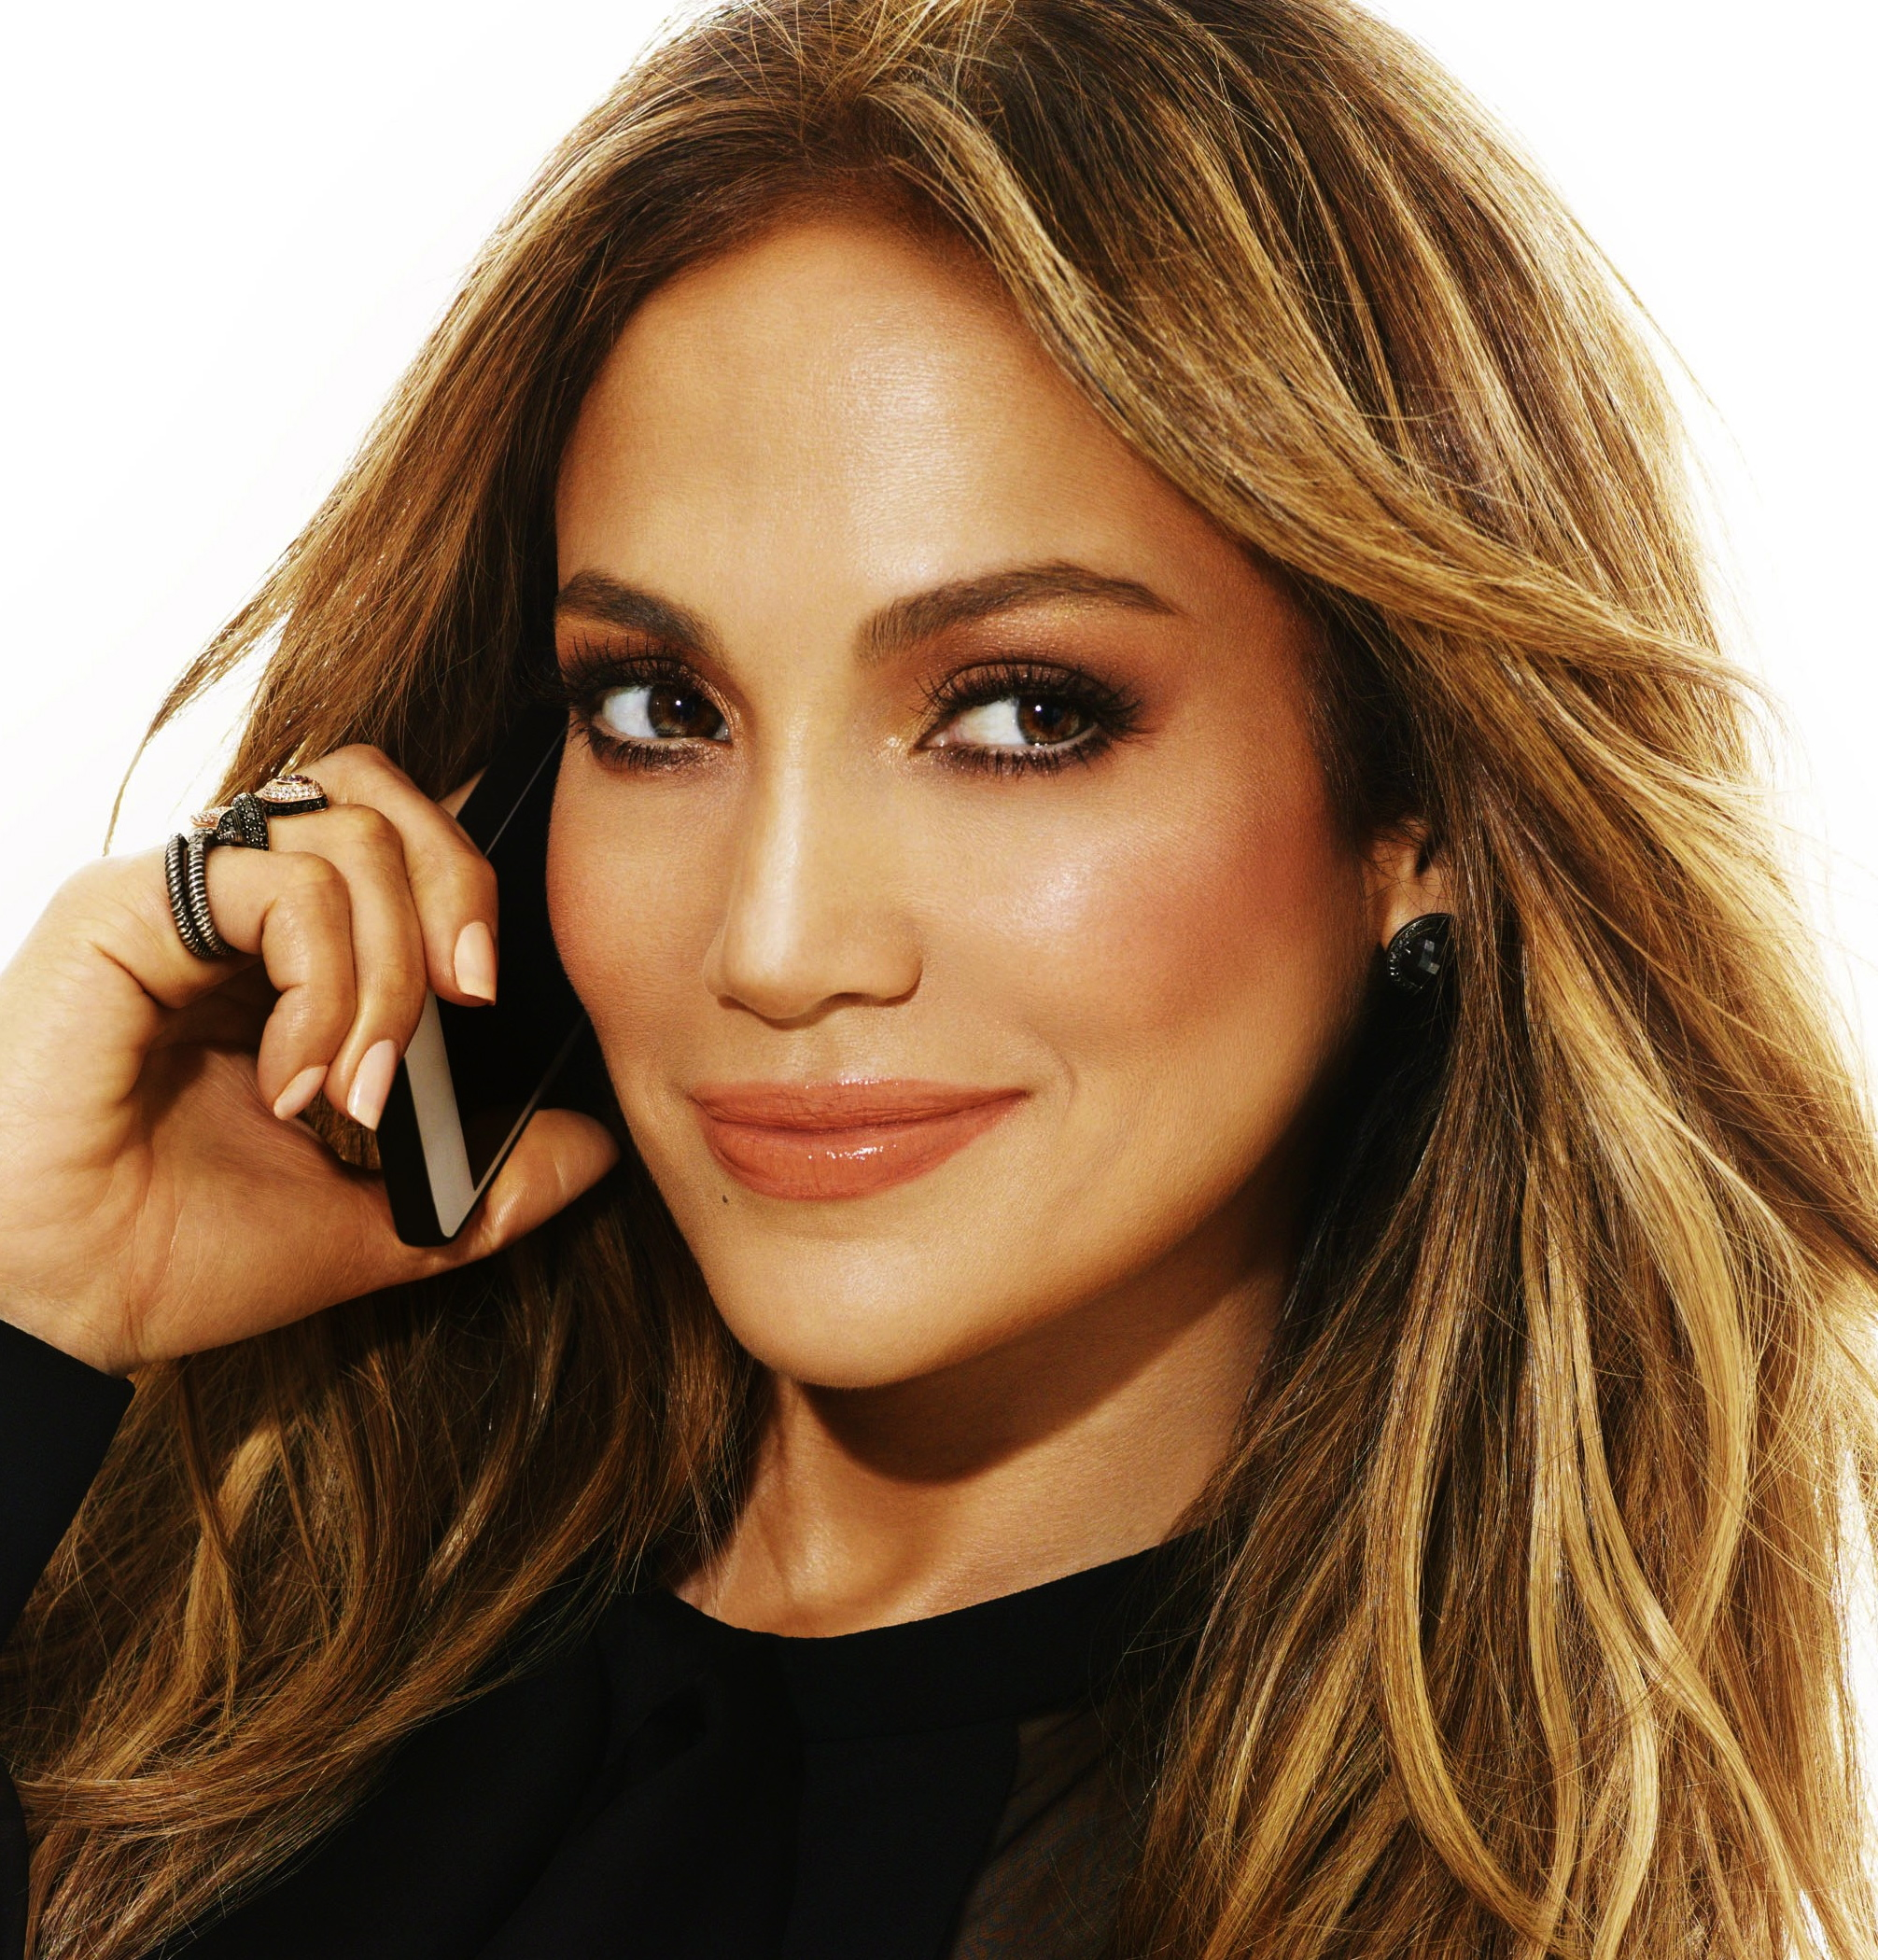 Galeria: Jennifer Lopez Erótico Chica Foot Galeria